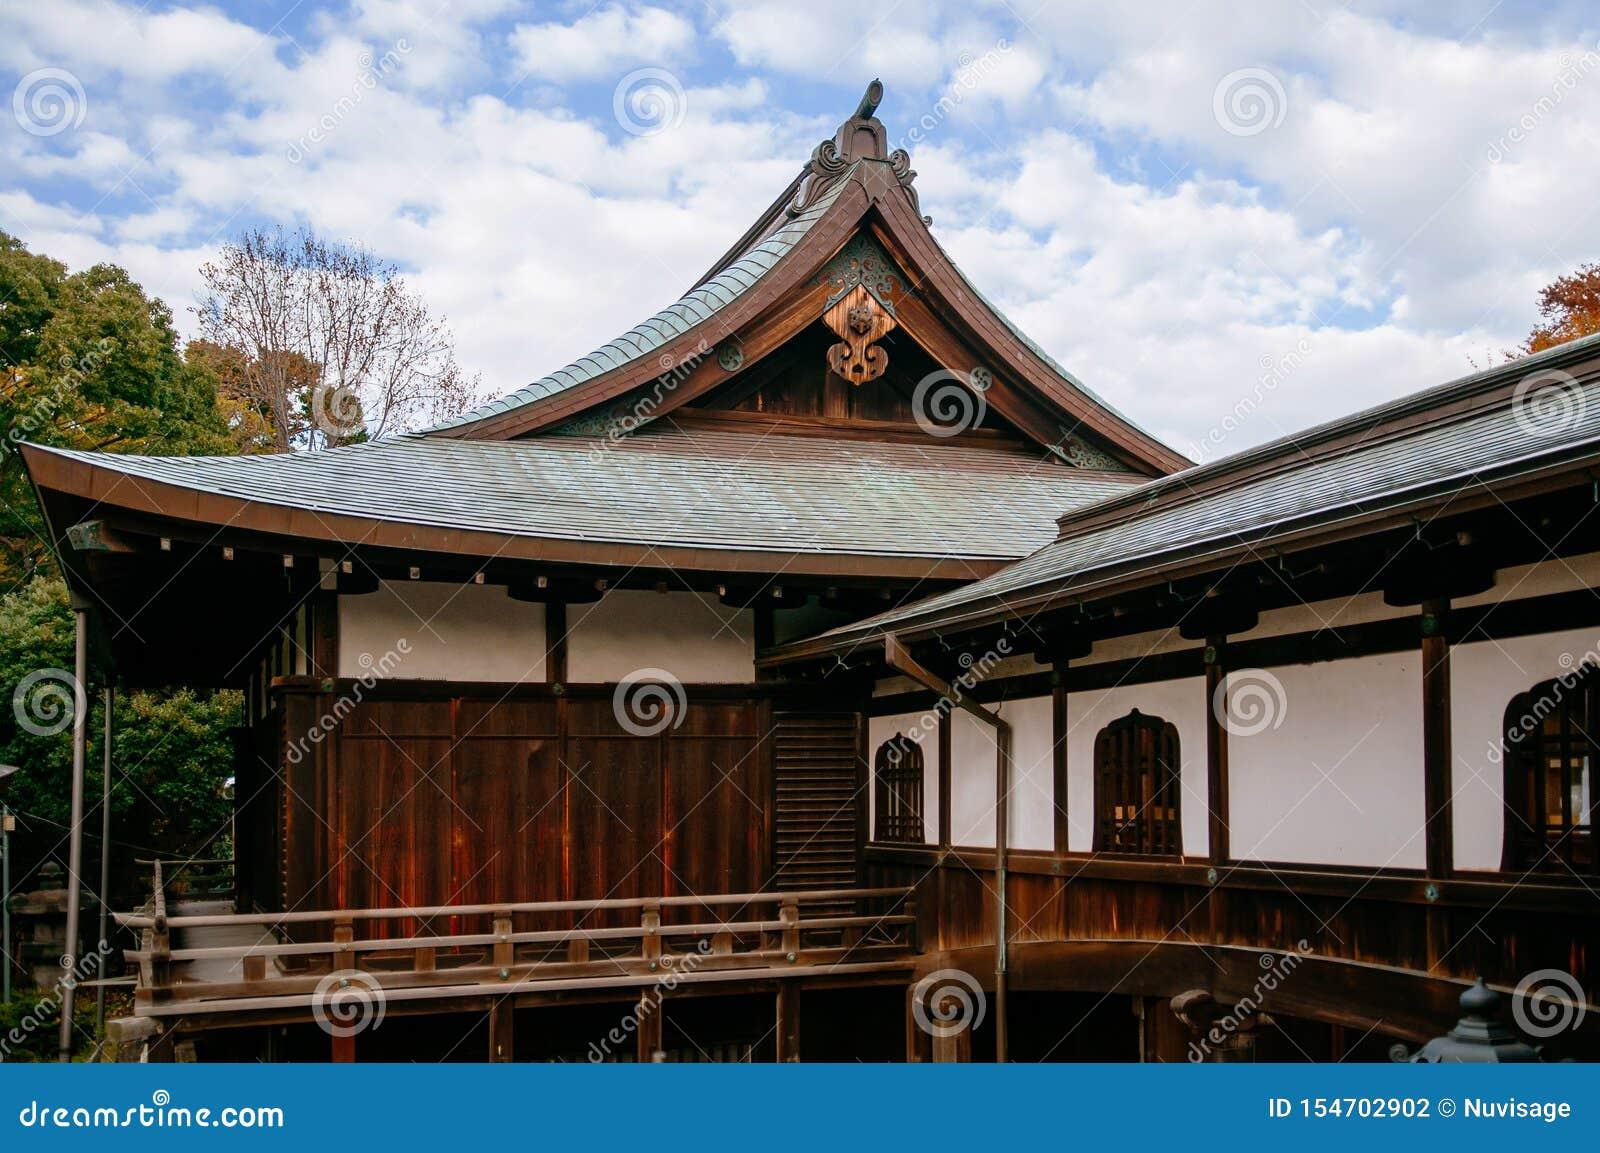 Old wooden building of Kiyomizu Kannon-do shrine in Ueno park, Tokyo